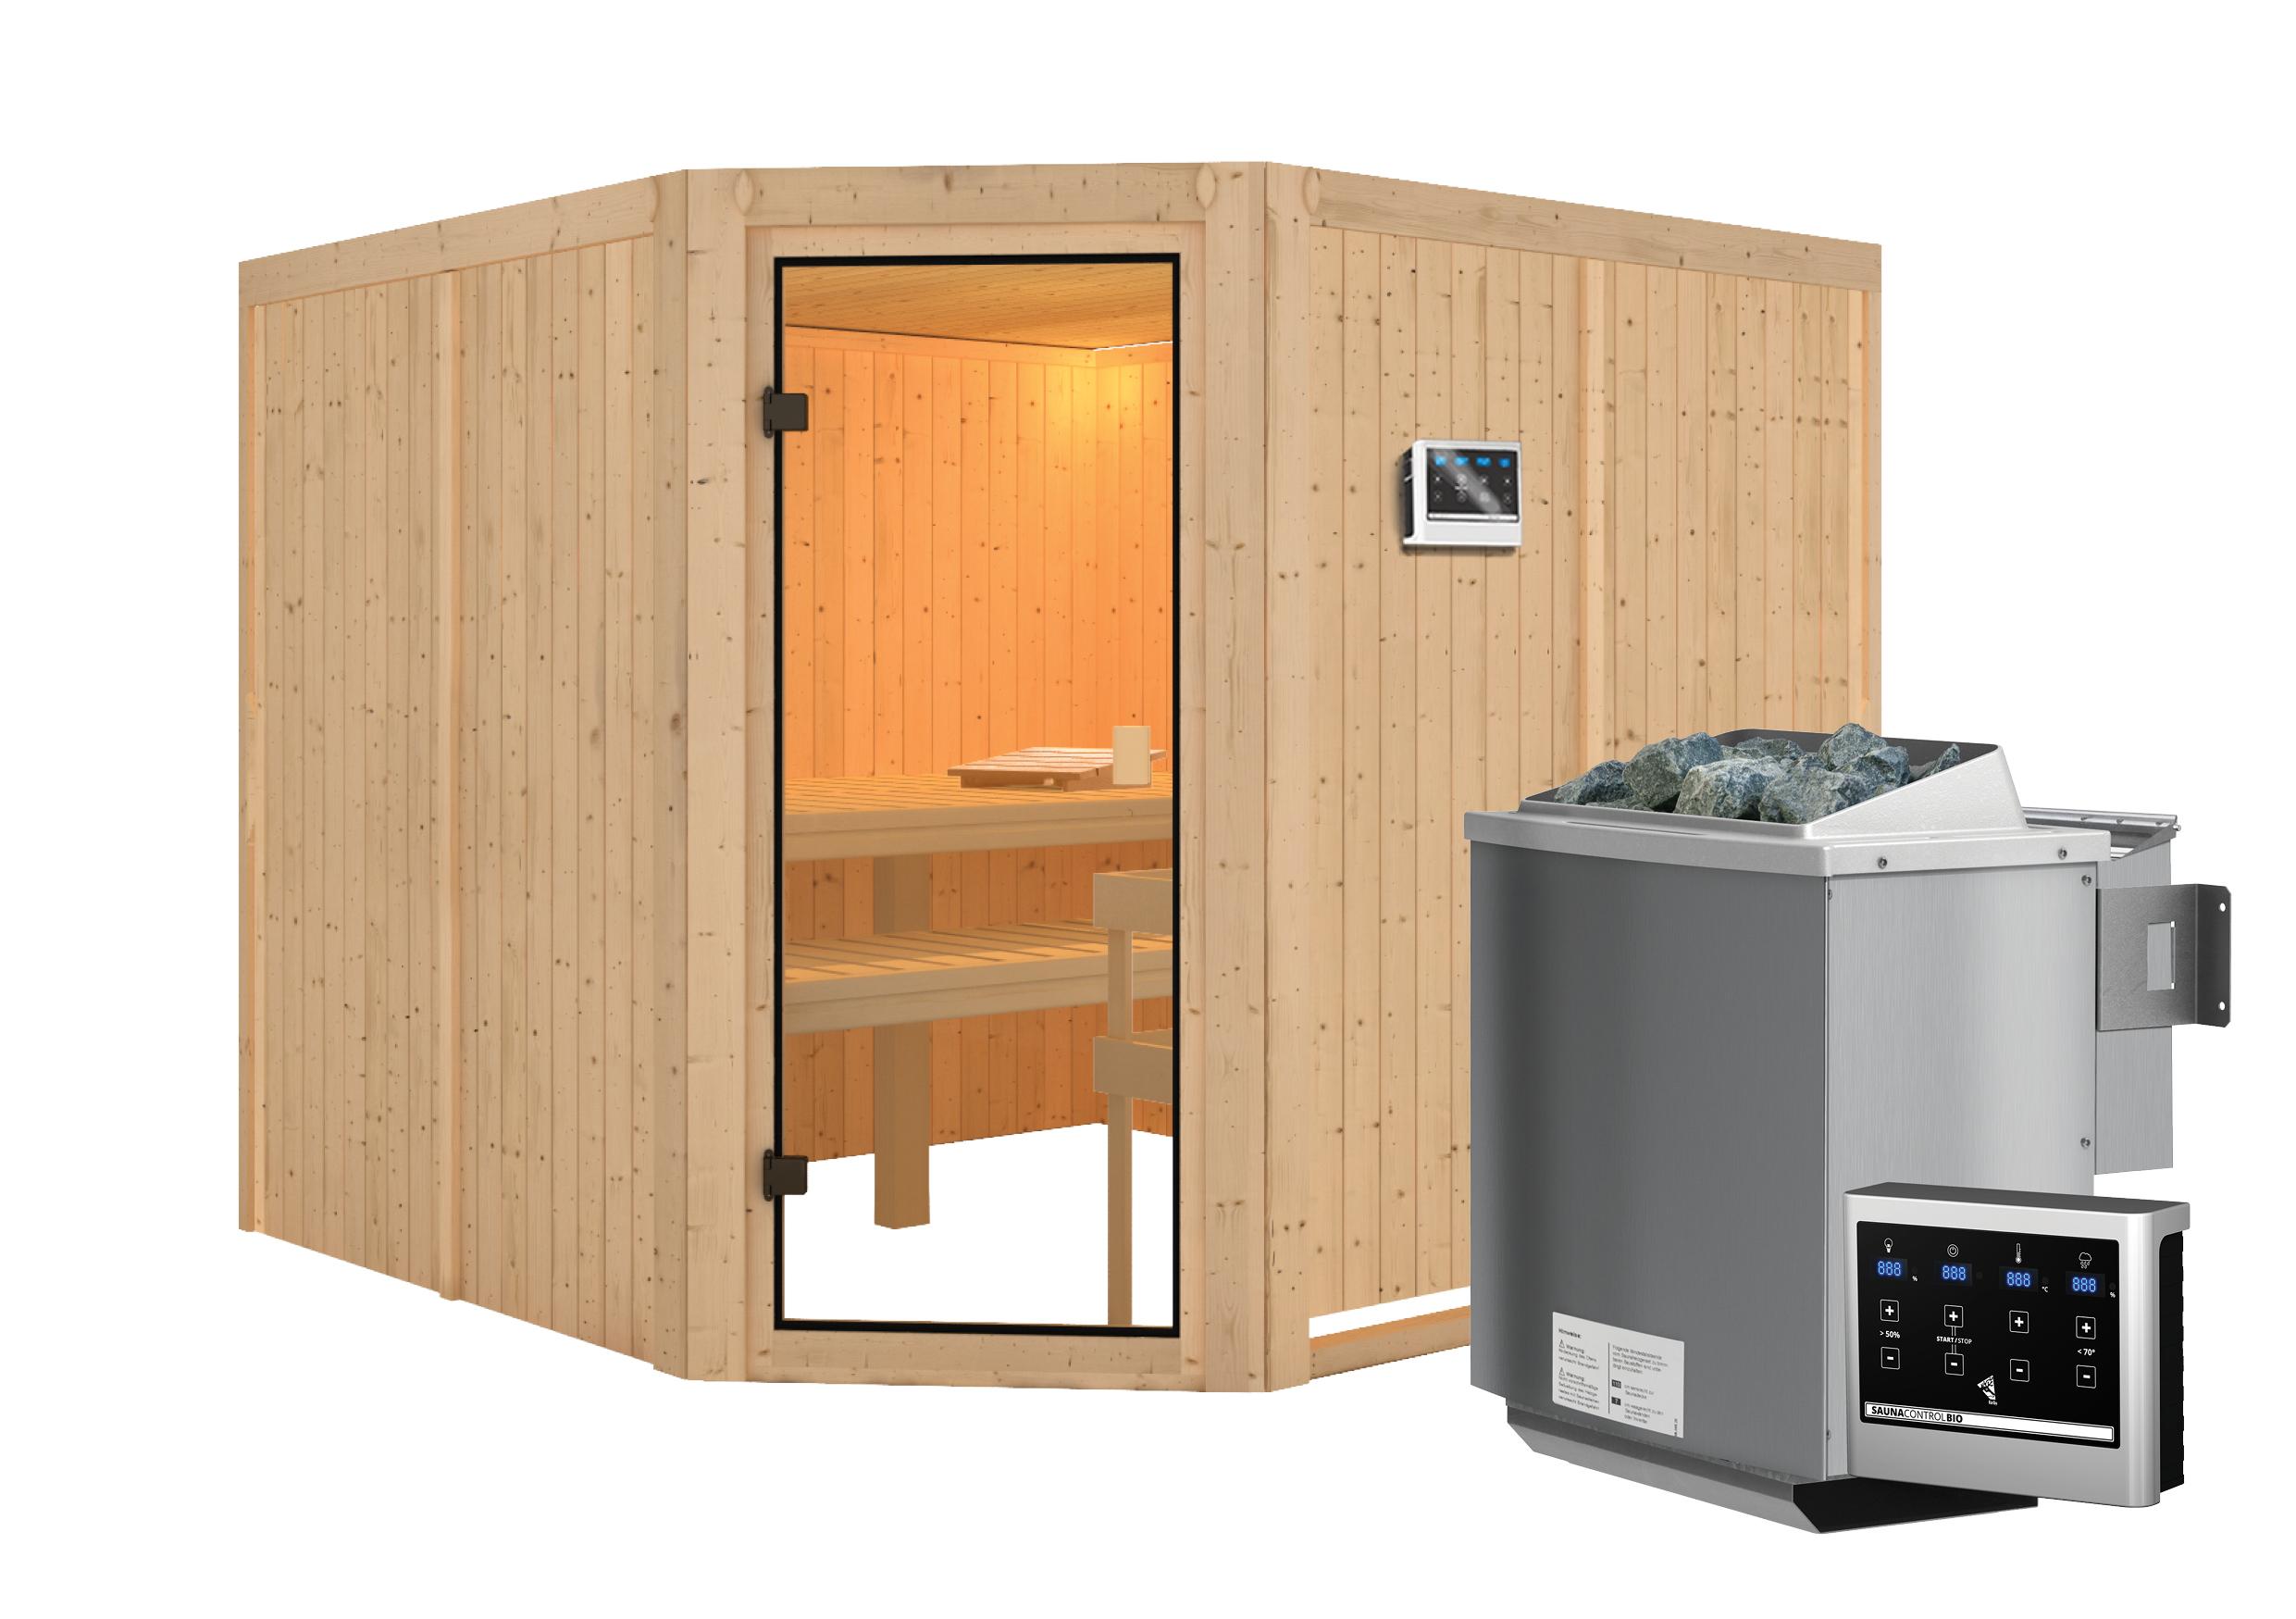 Woodfeeling Sauna Ystad 68mm Bio Saunaofen 9kW extern Bild 12